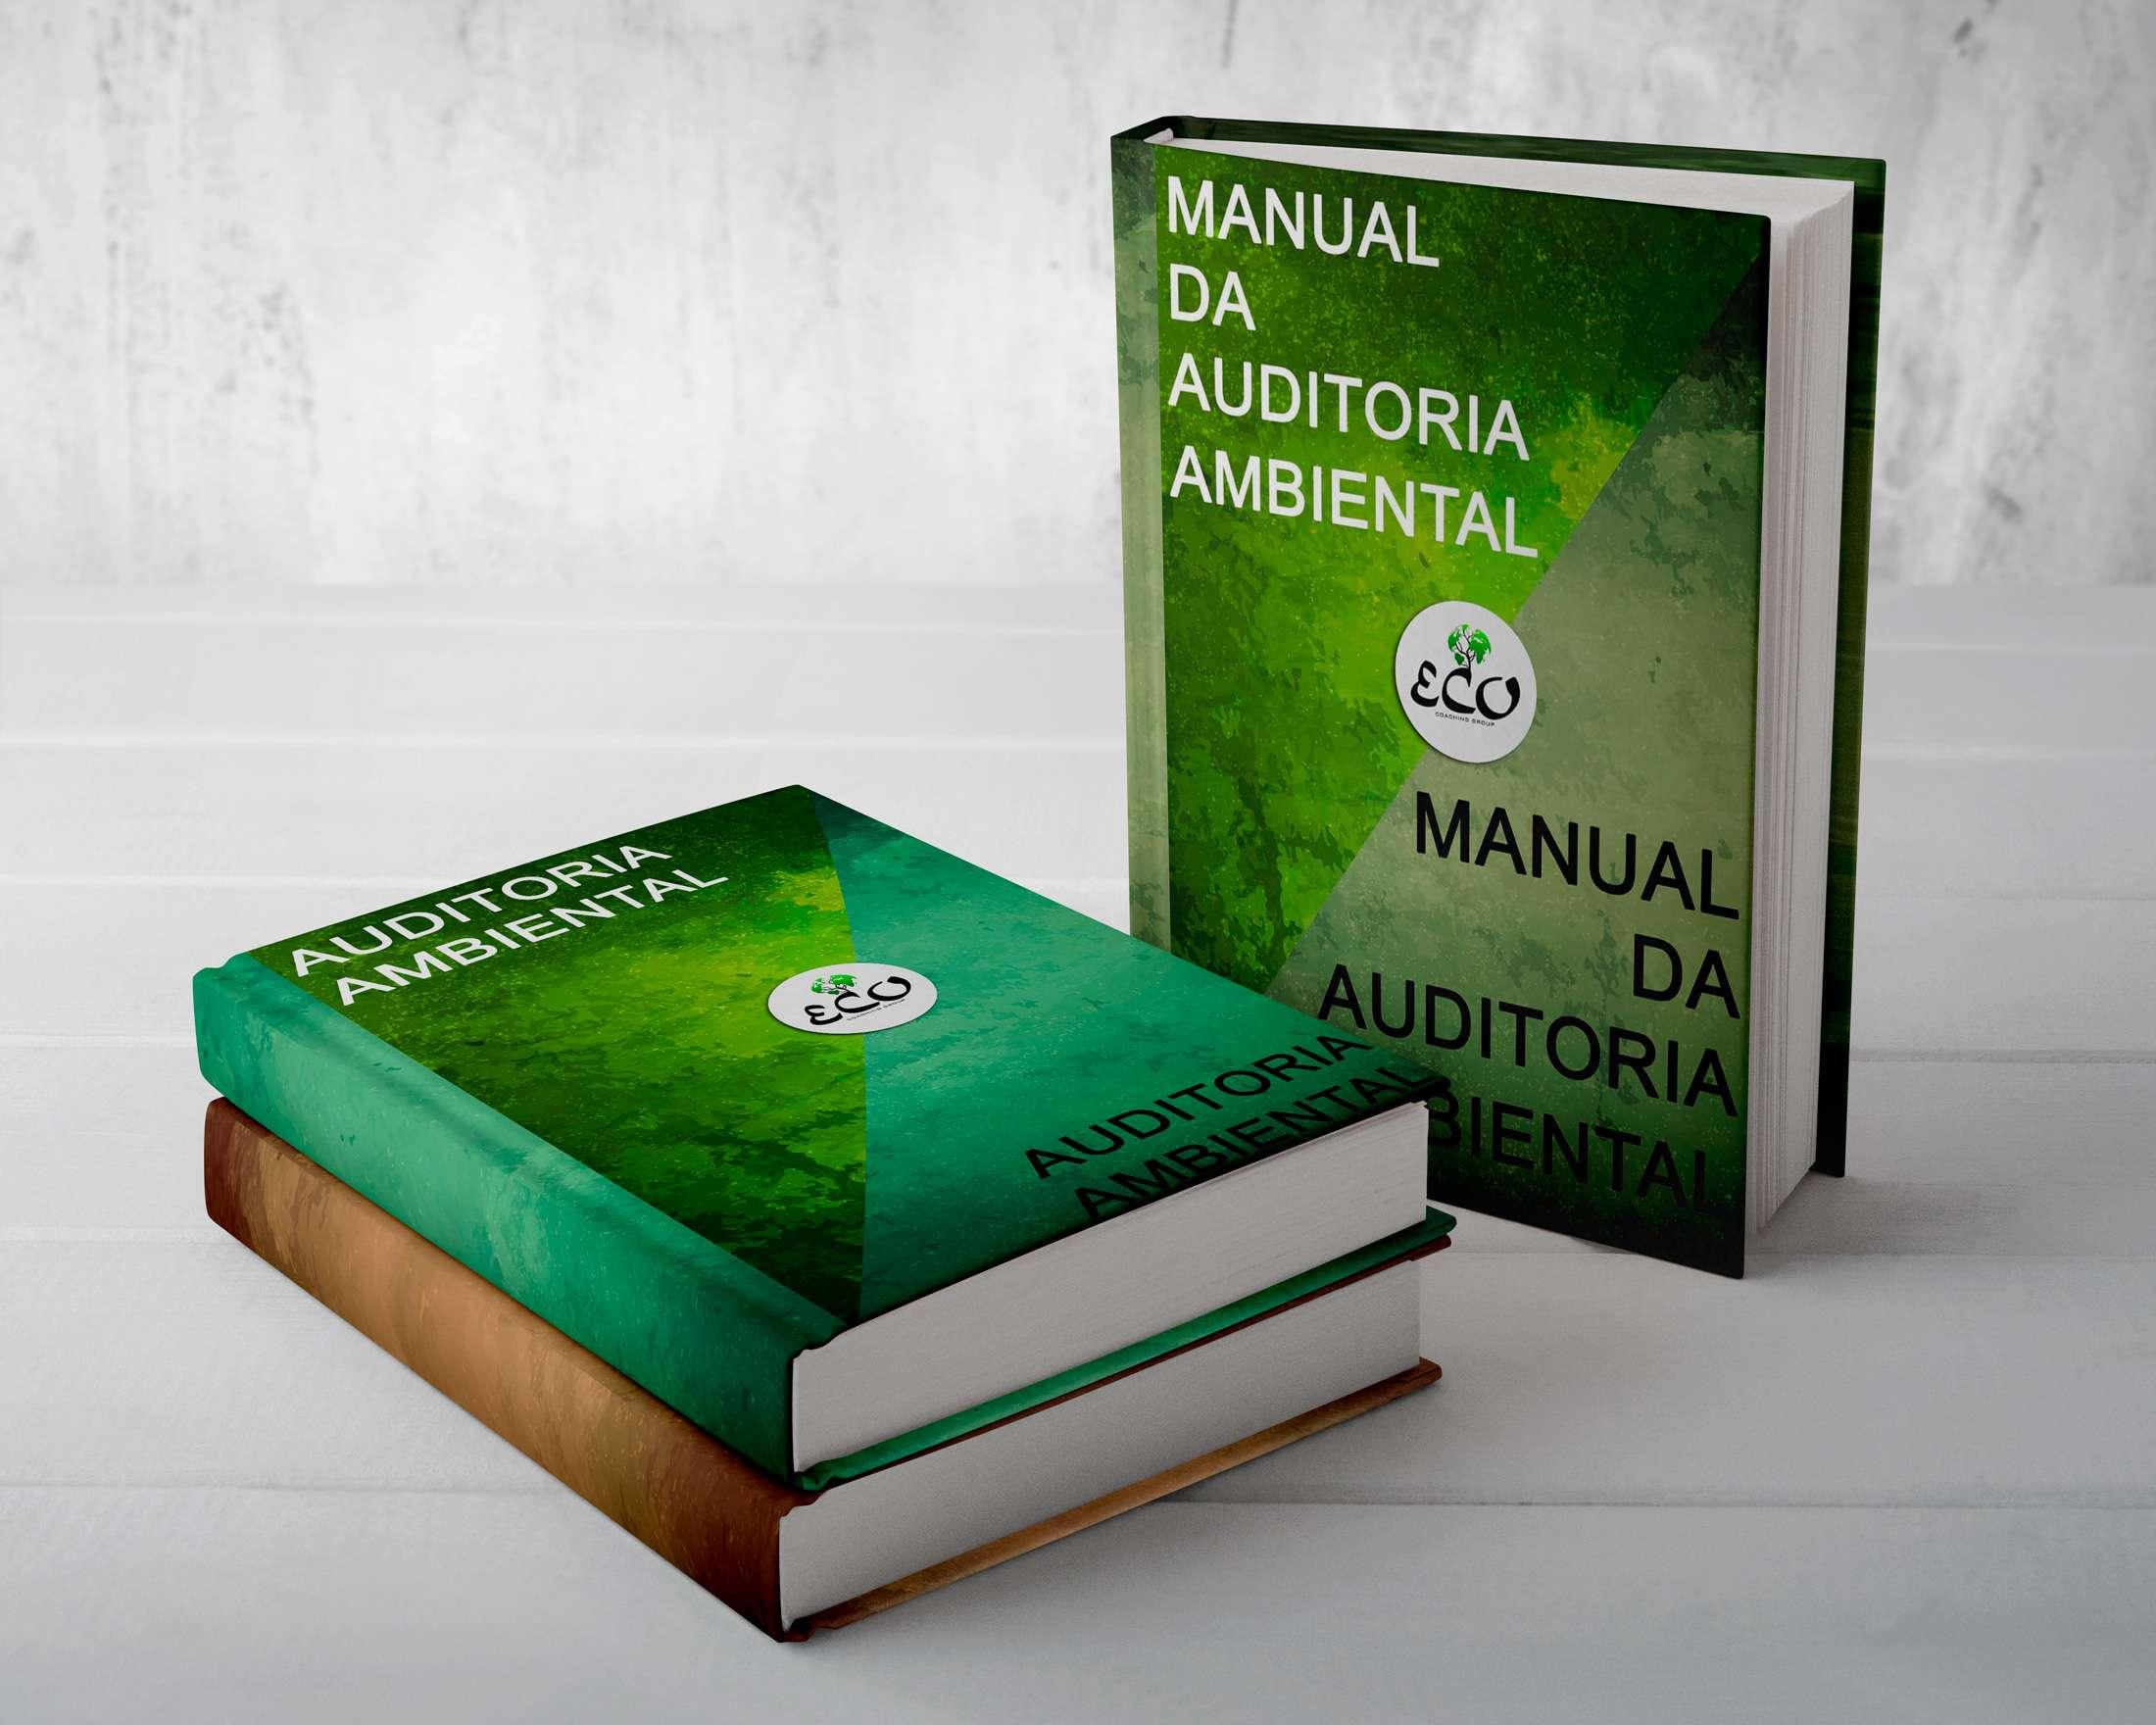 Manual da Auditoria Ambiental